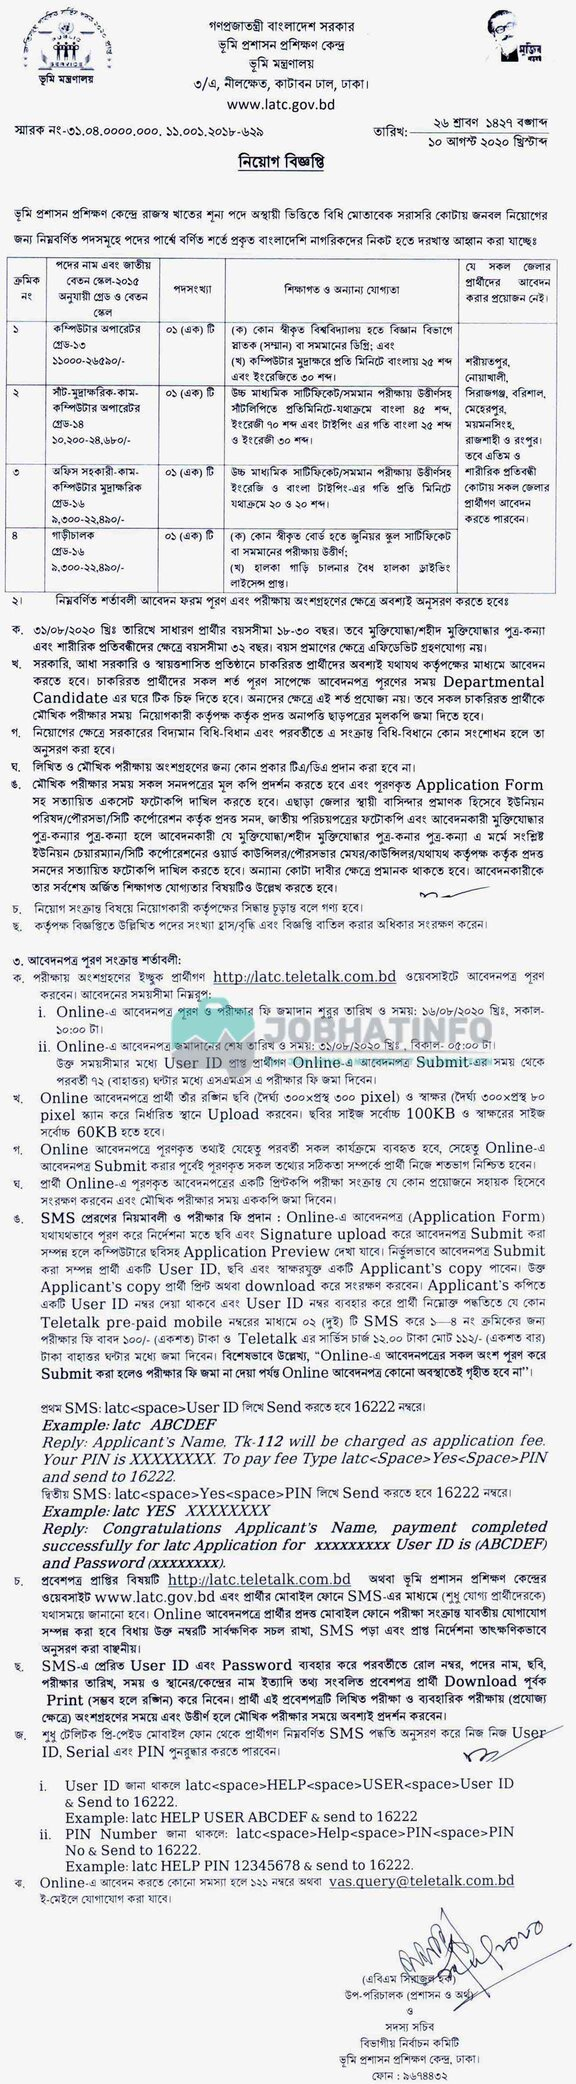 Ministry of Land Job Circular 2021 | Apply from Today | Govt Job 4